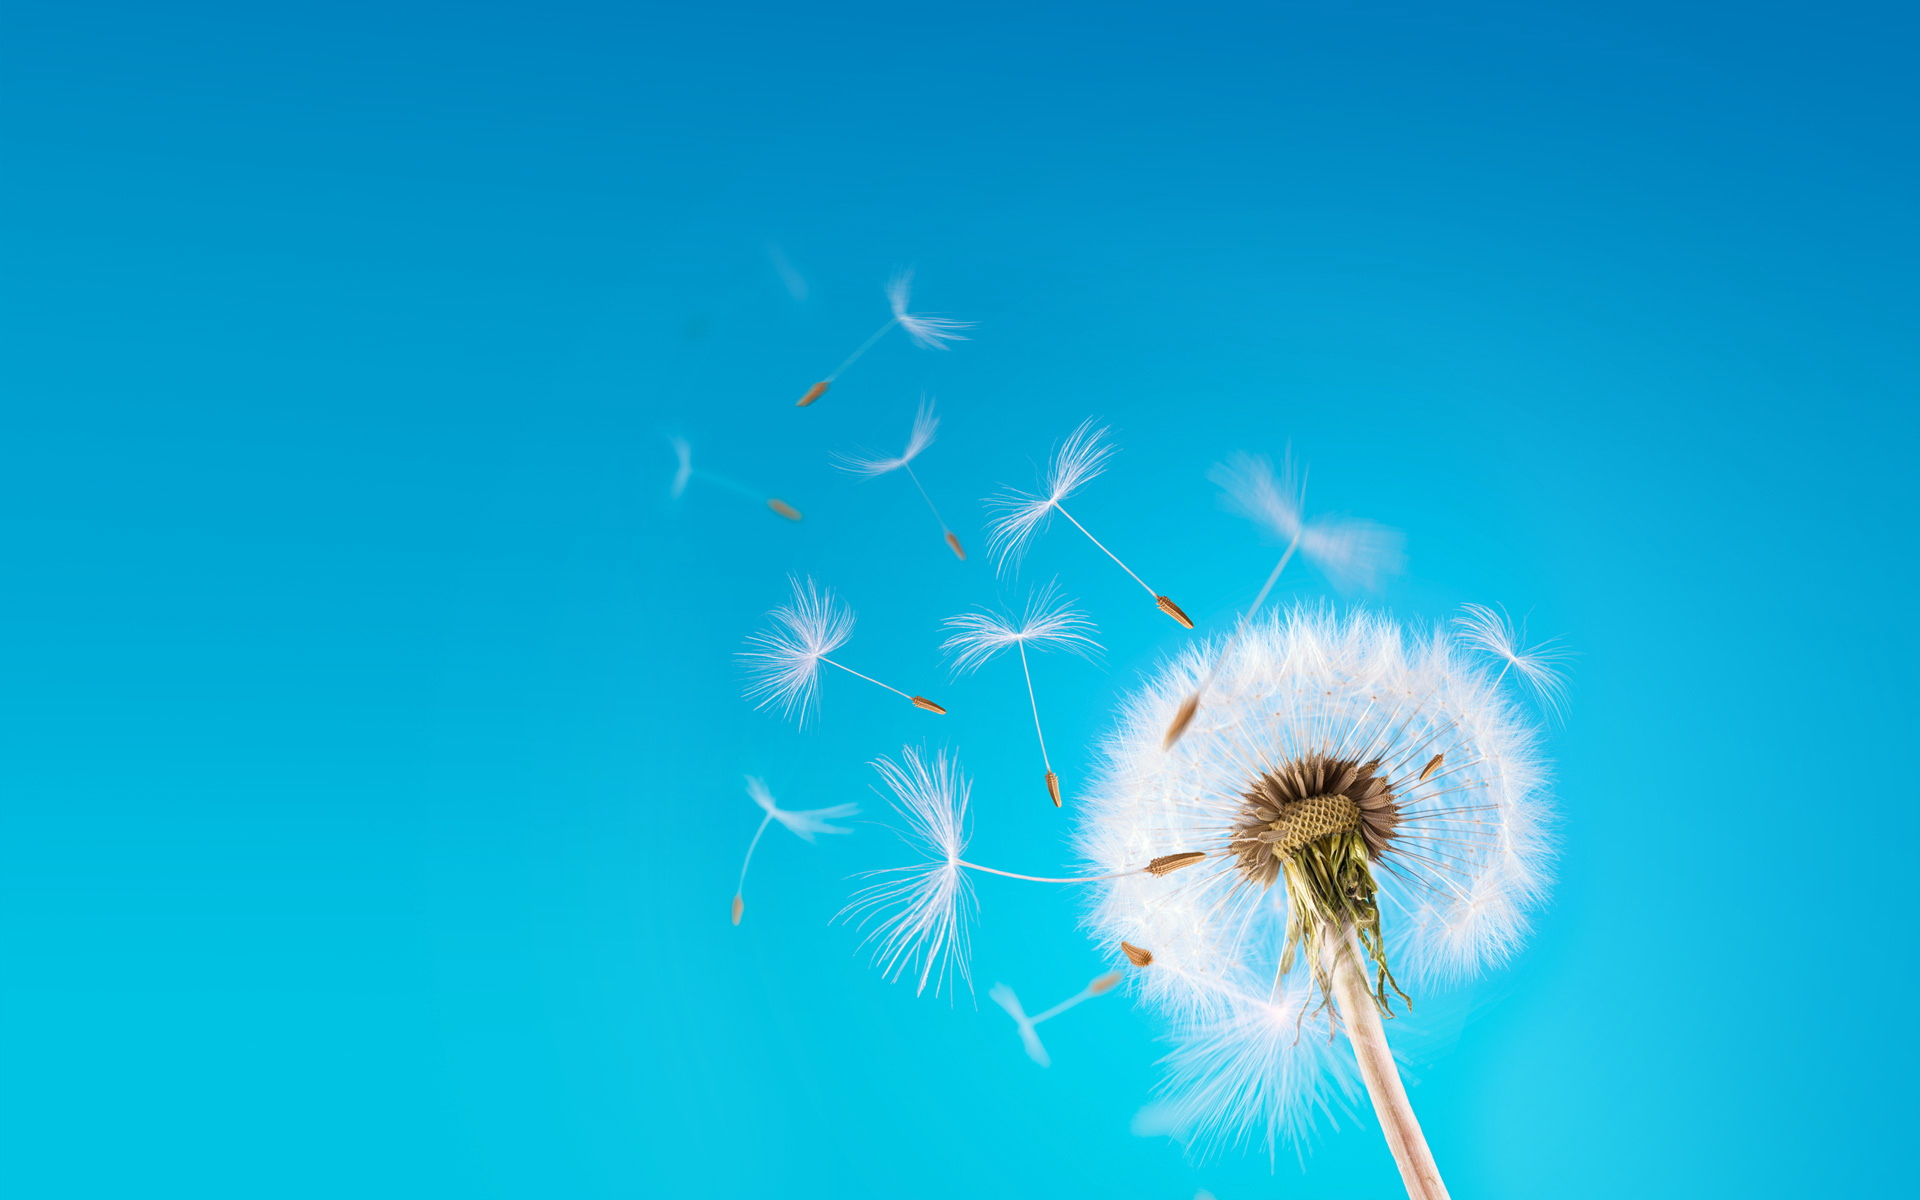 Dandelion Flying Seeds Photo